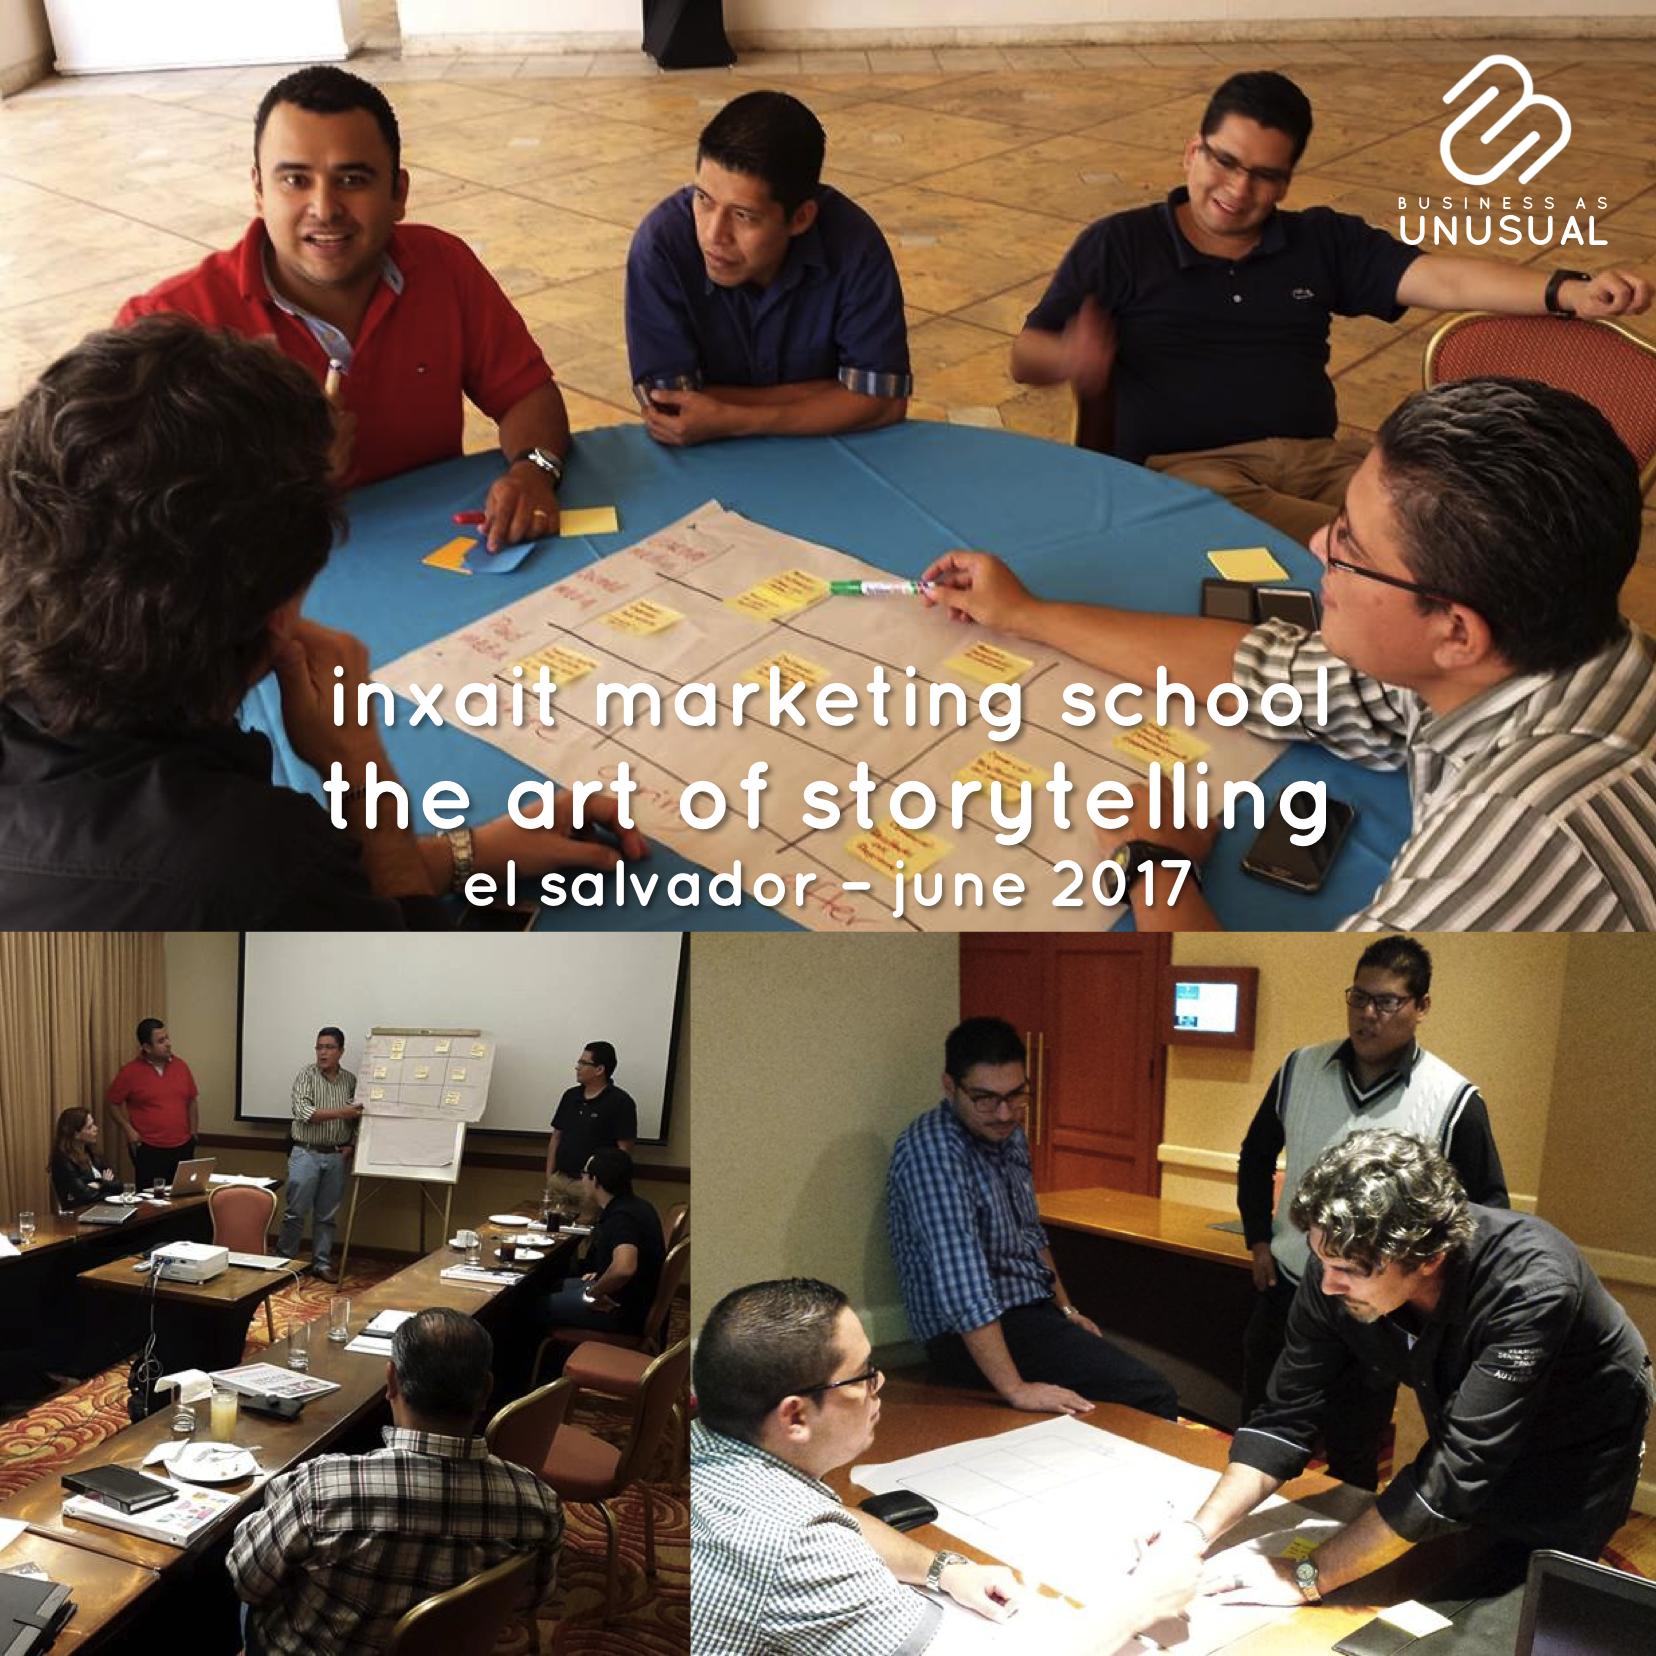 INXAIT Marketing School - The Art of Storytelling